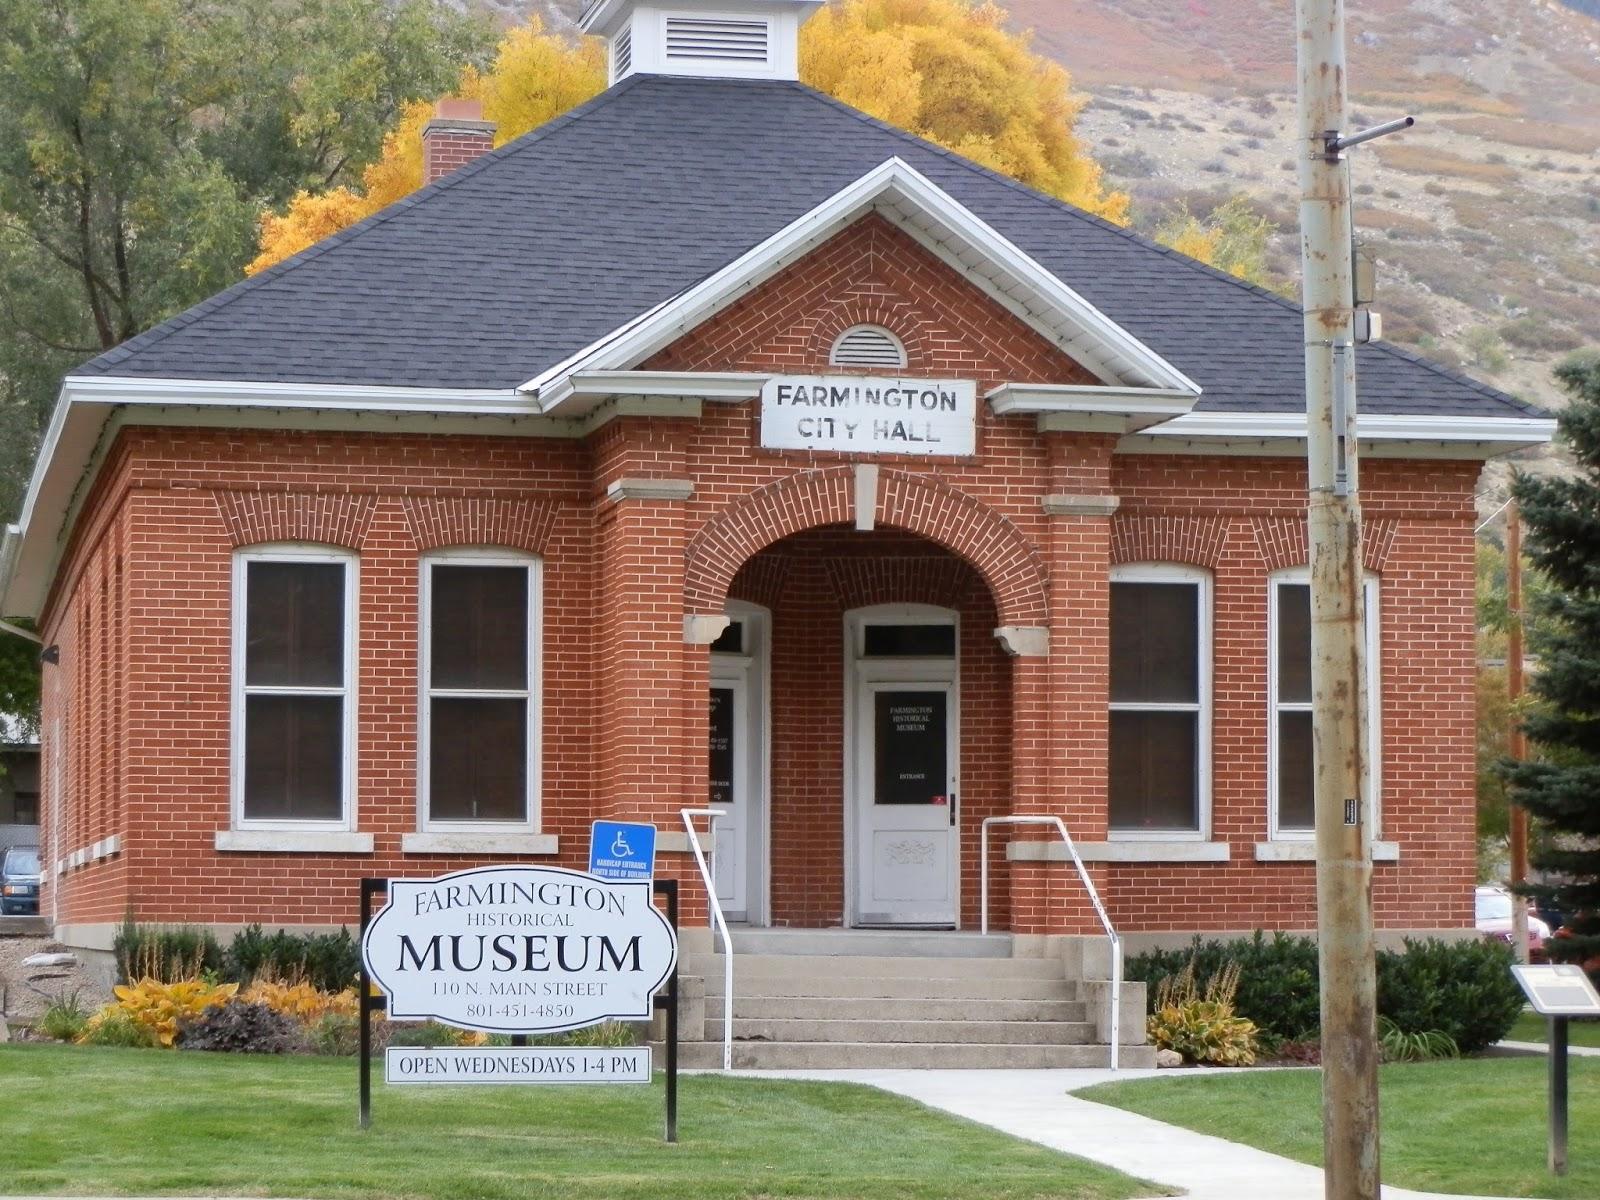 Foyer Museum Utah : Prepared lds family my photo tour of farmington utah